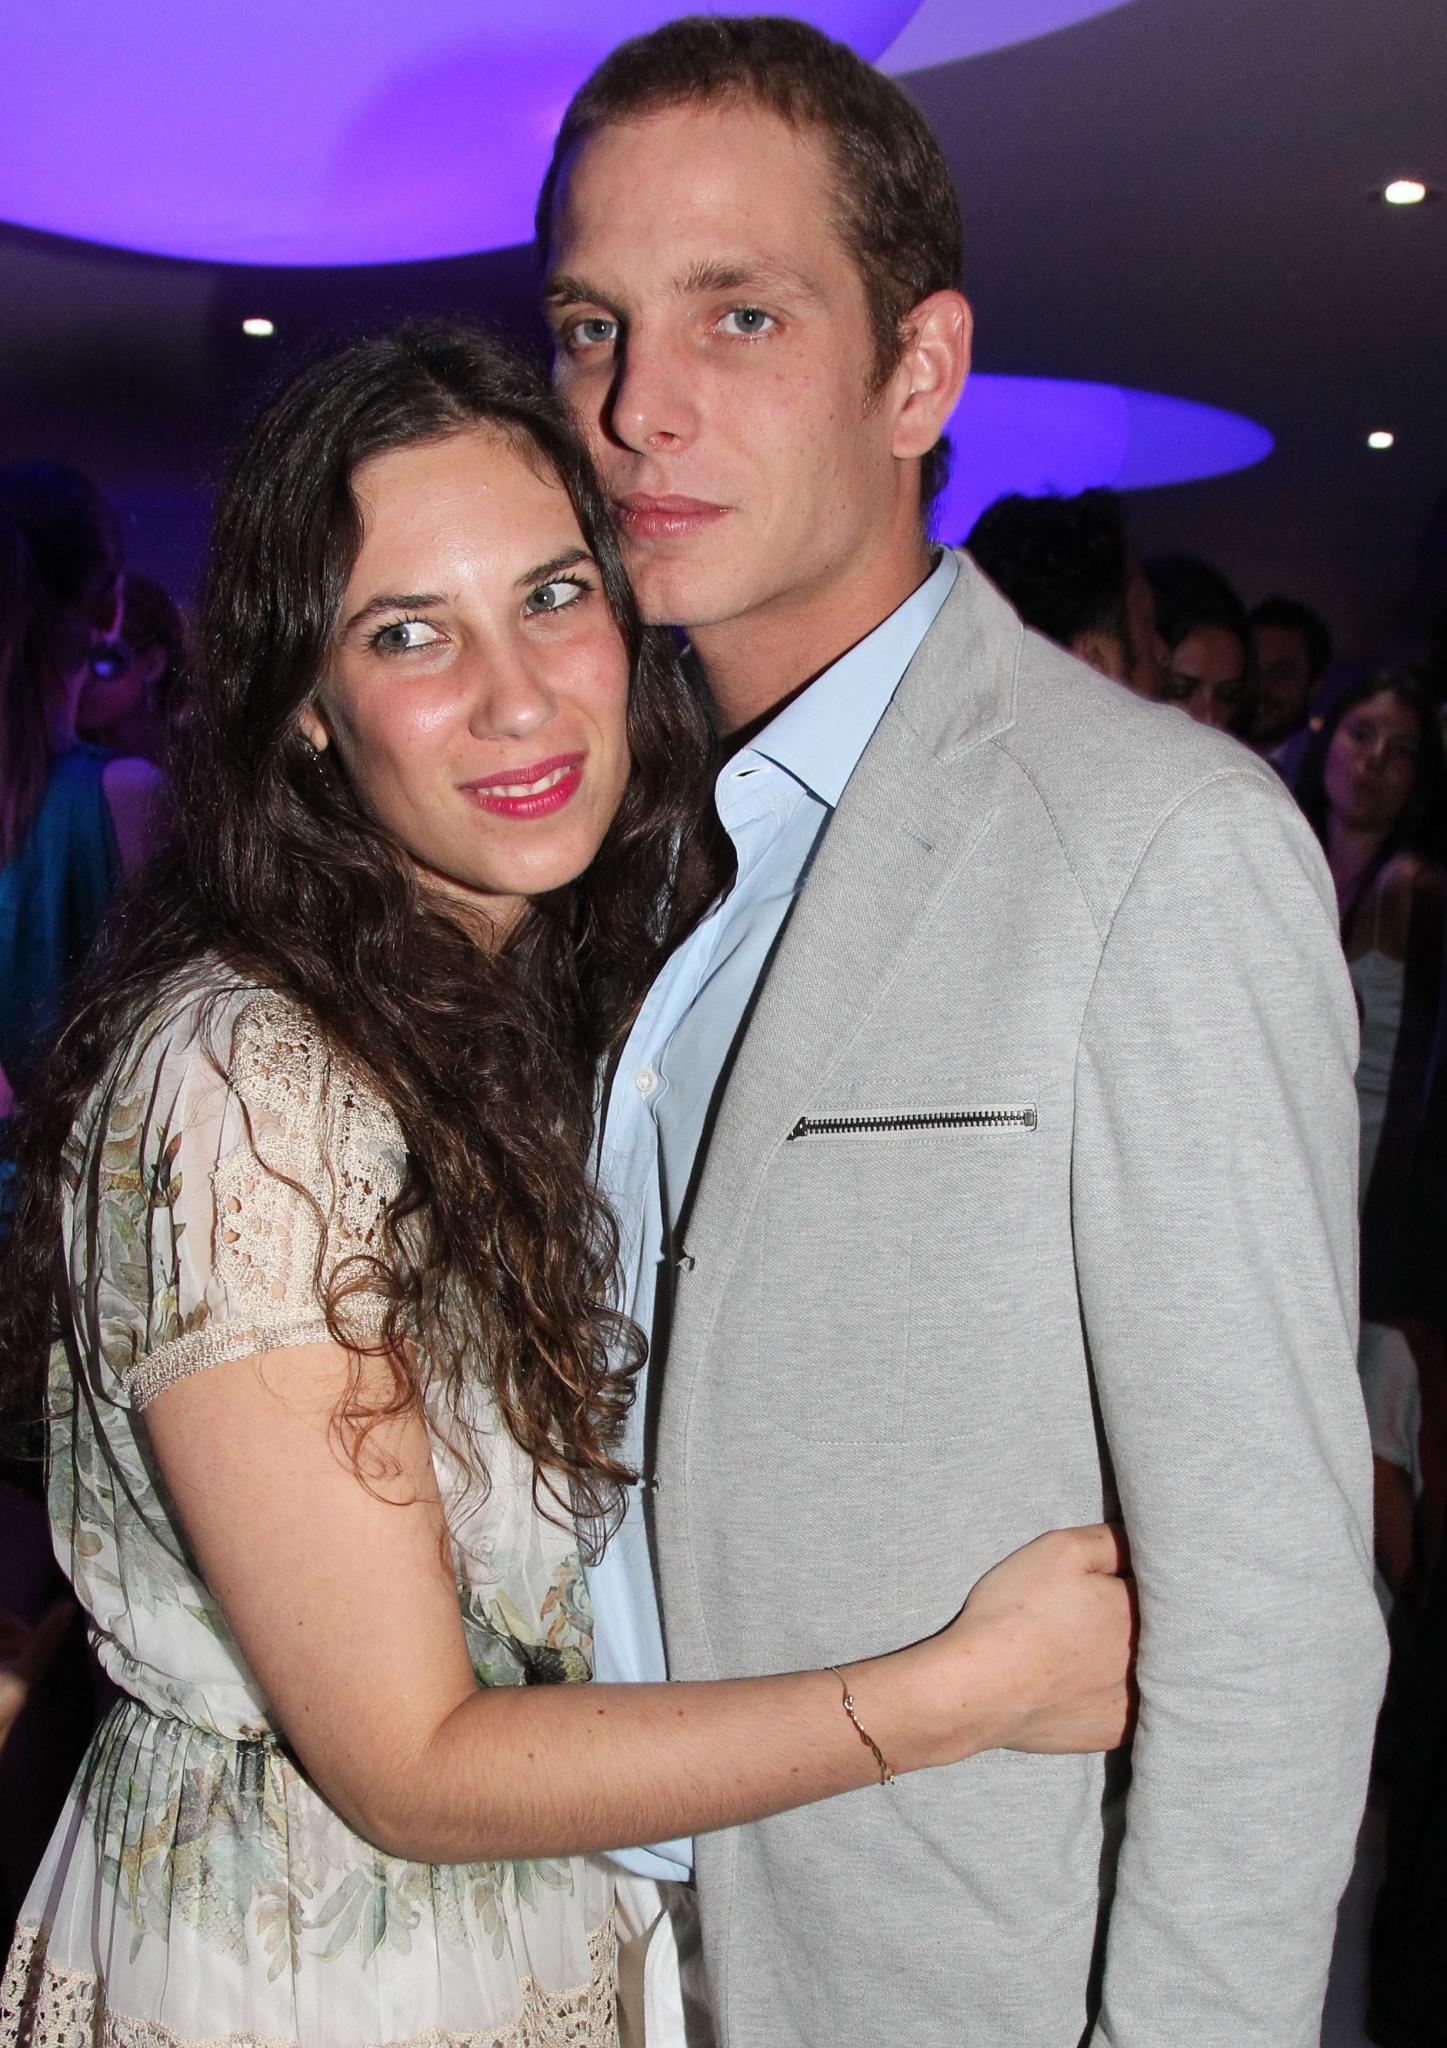 Tatiana Santo Domingo, Andrea Casiraghi